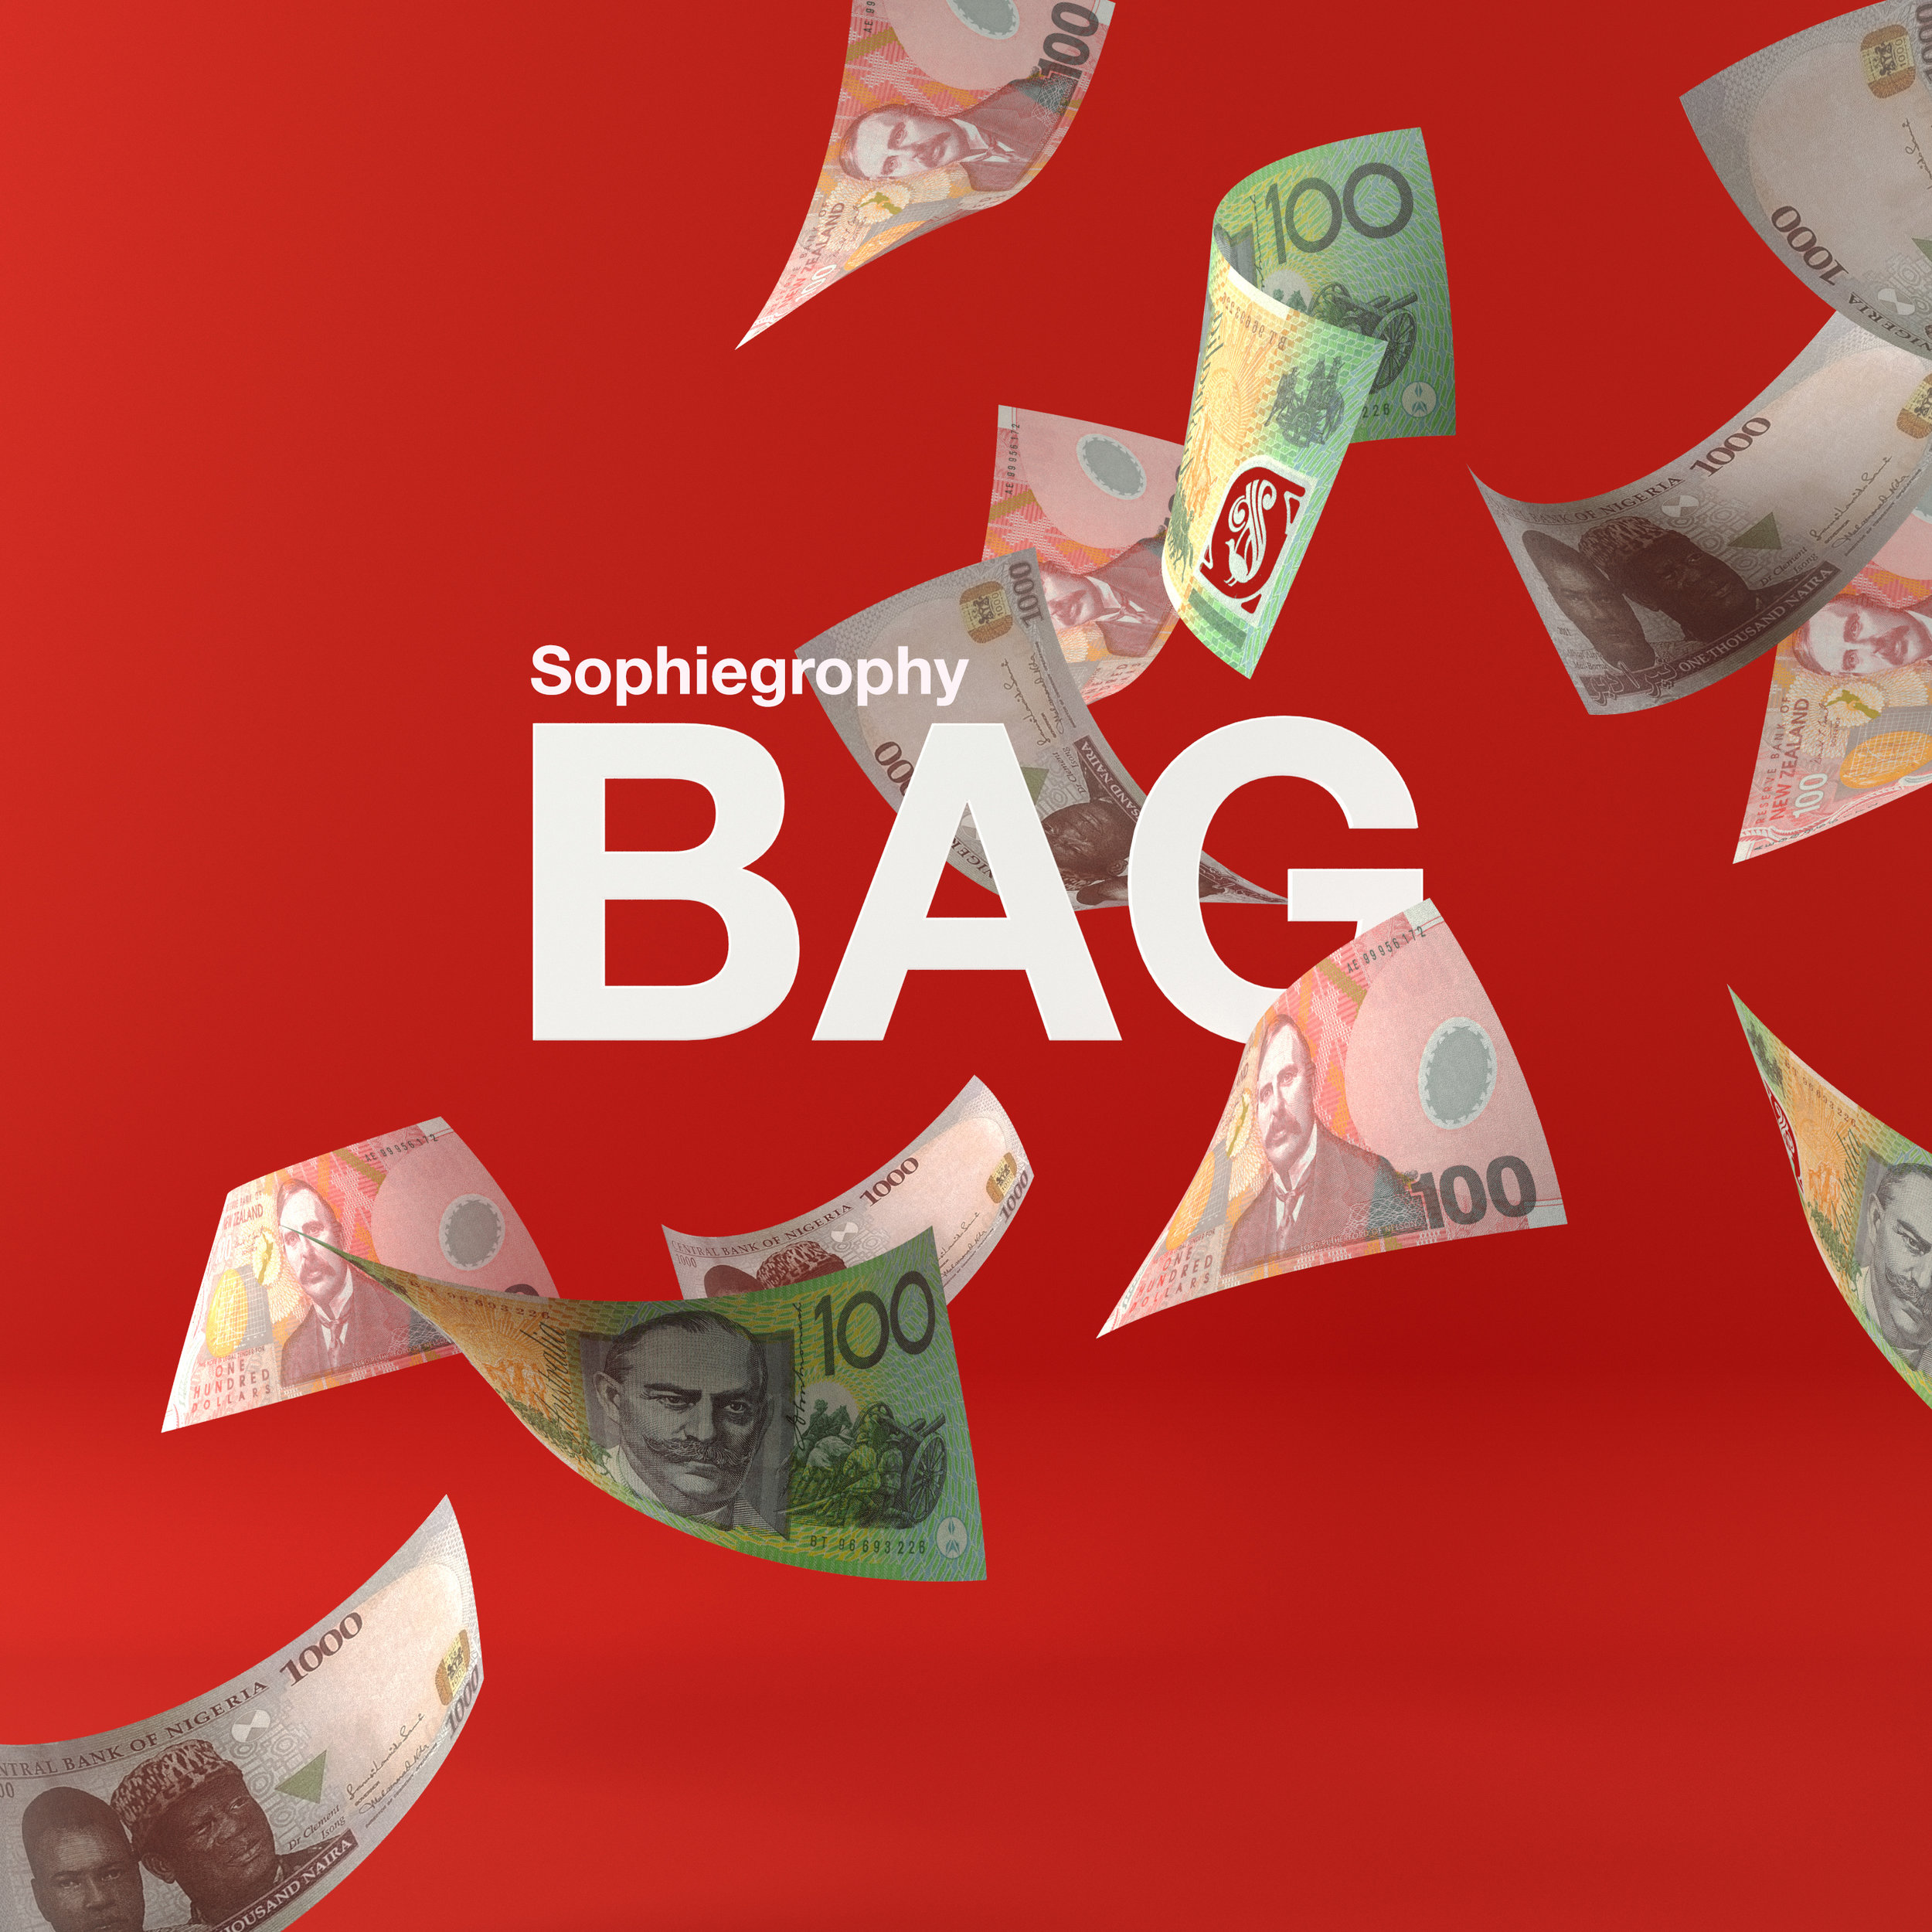 WVS031 - Sophiegrophy - Bag - Artwork.jpg